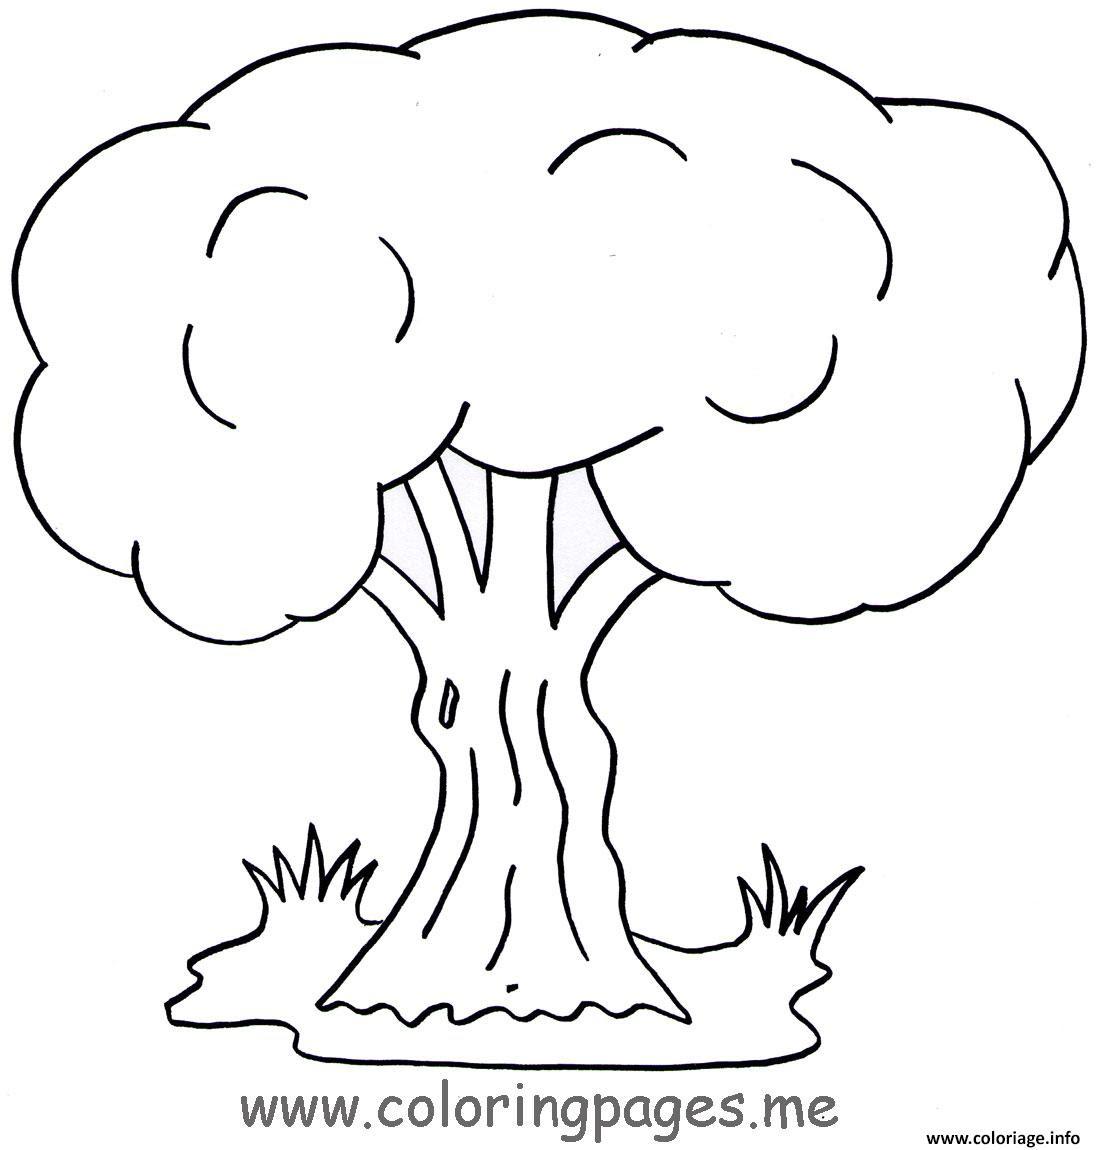 Coloriage Arbre 125 Dessin  Imprimer